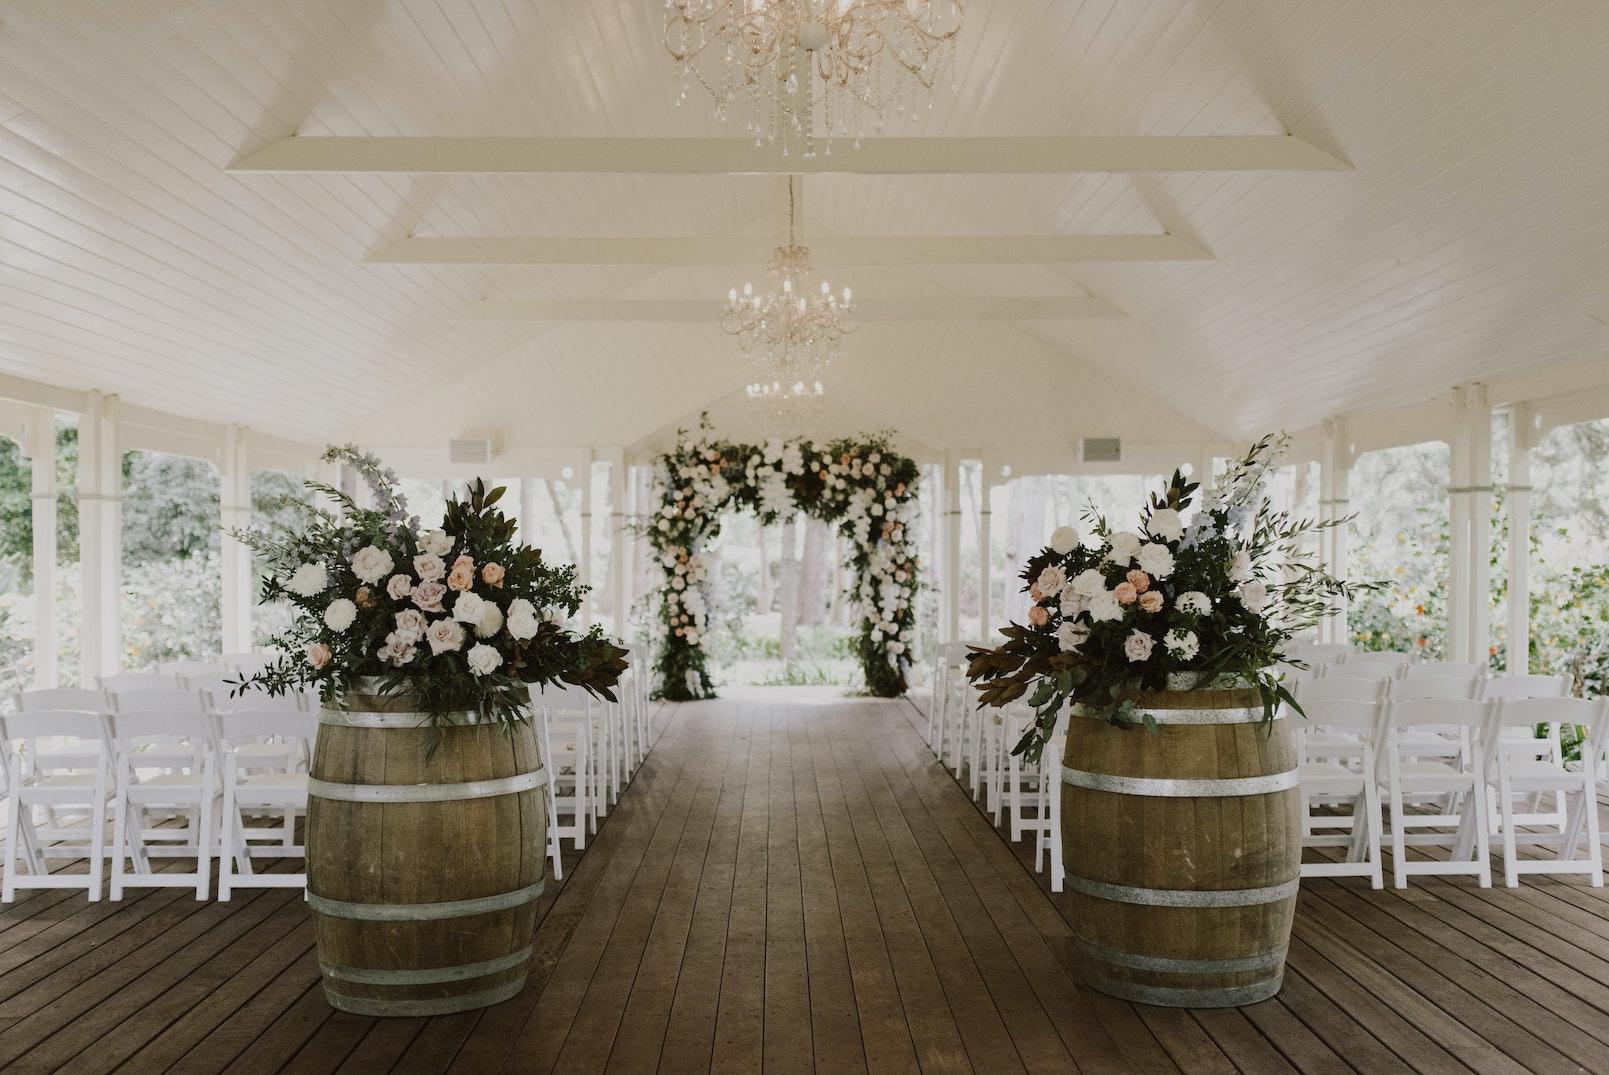 Wedding ceremony in pavilion